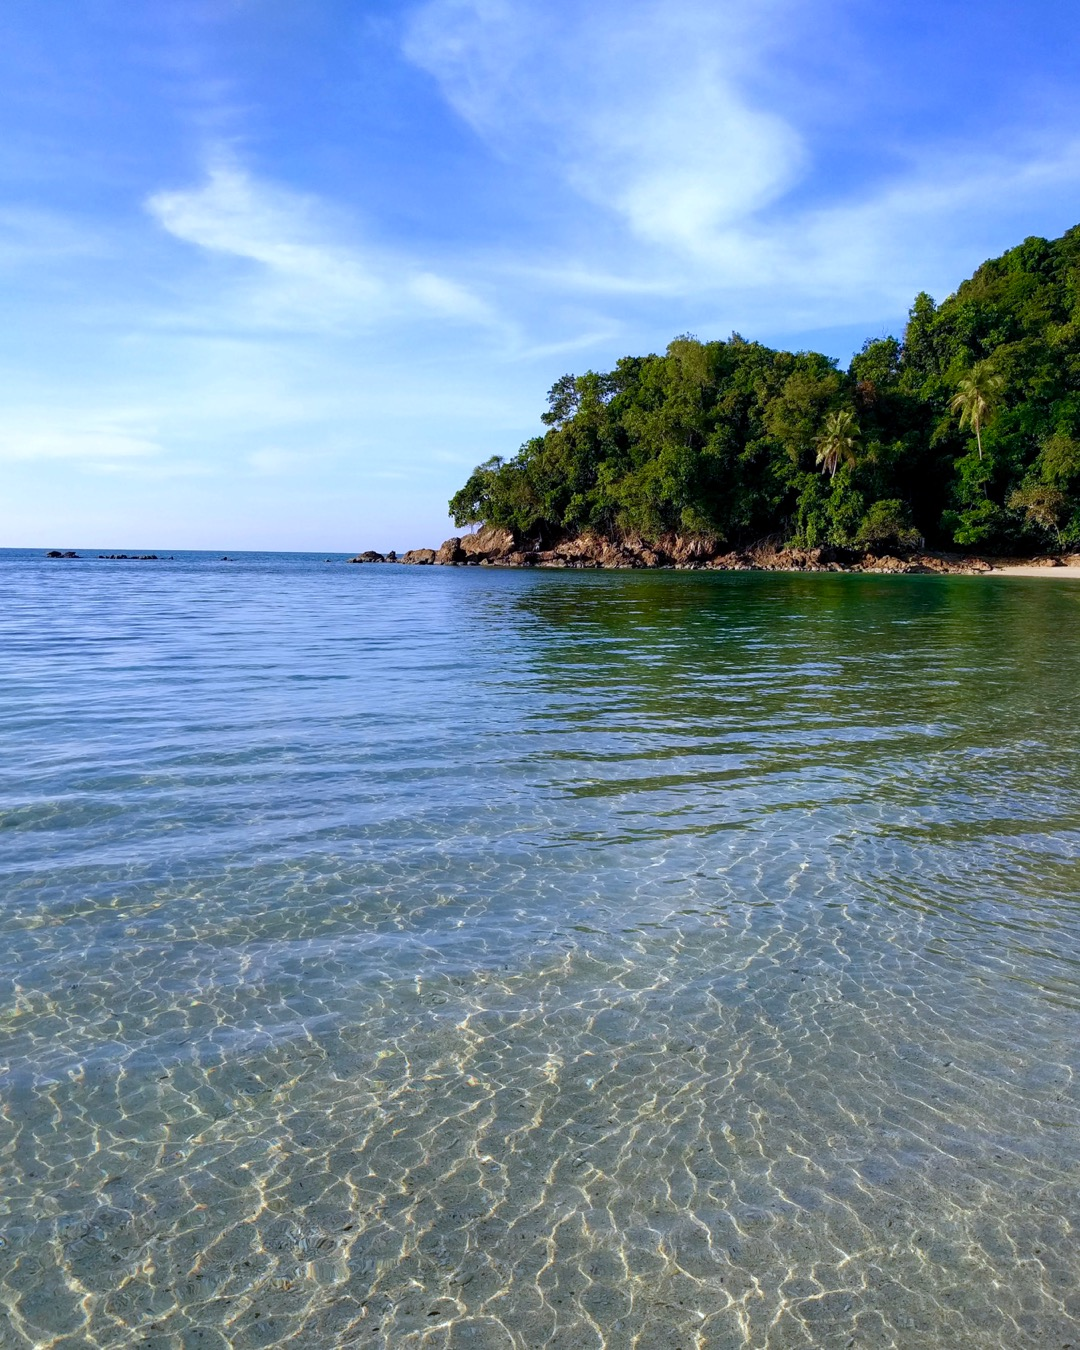 Harmony Campsite's Beach on Pulau Kapas